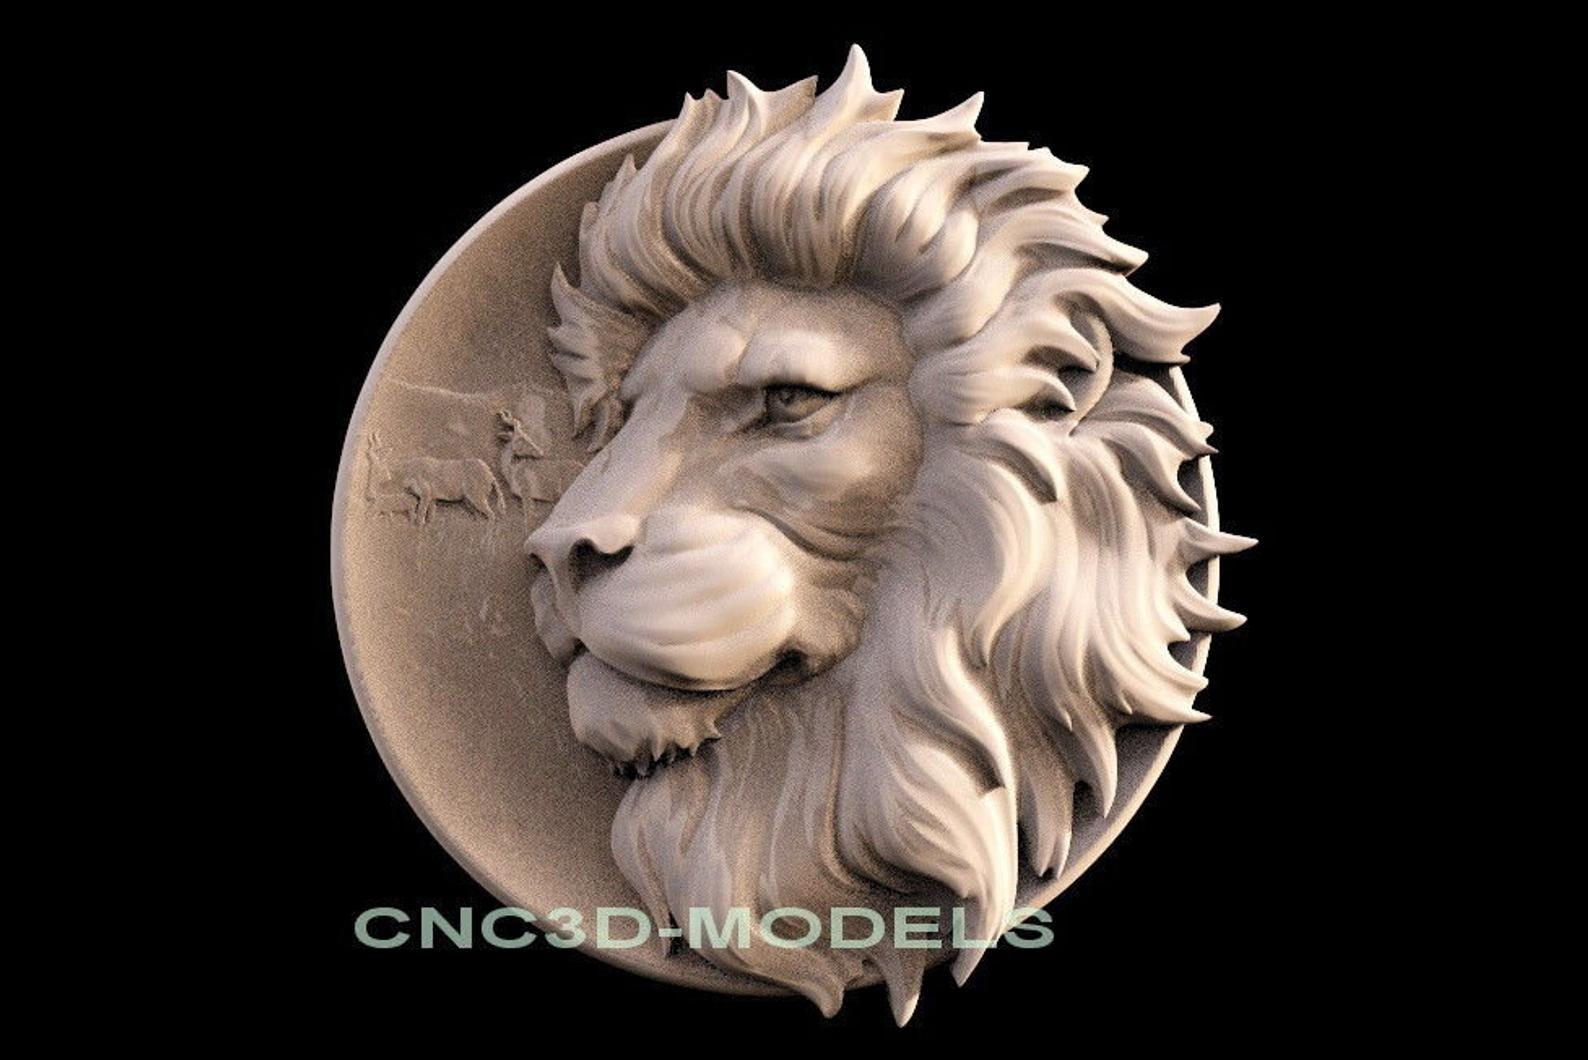 3D STL* Model for CNC Router Engraver Carving Machine